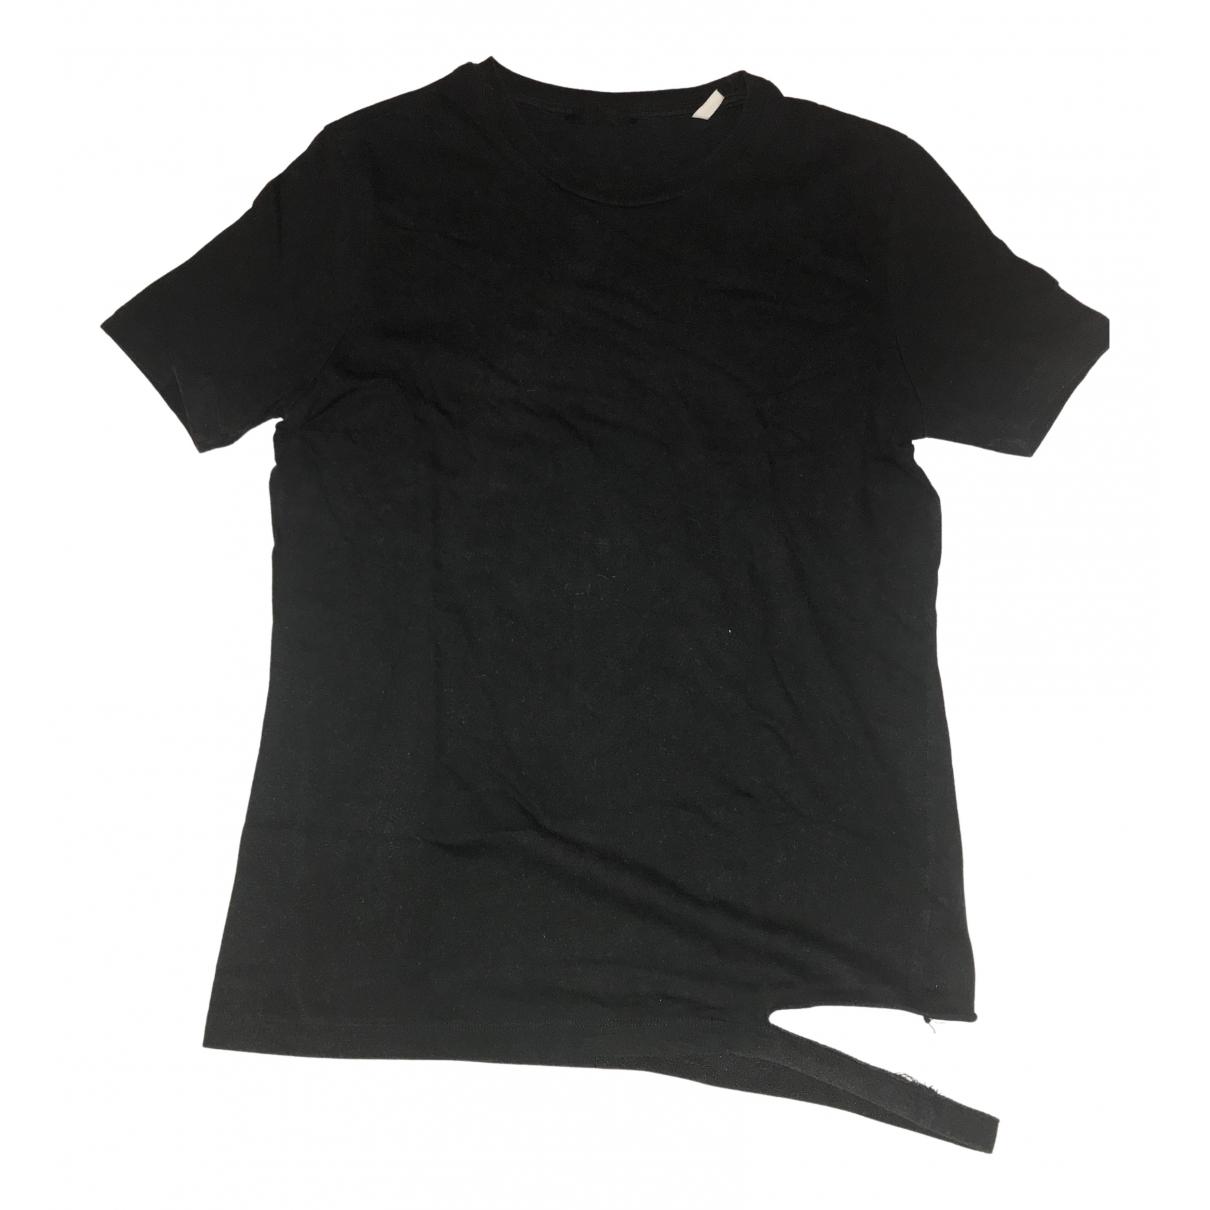 Helmut Lang \N T-Shirts in  Schwarz Baumwolle